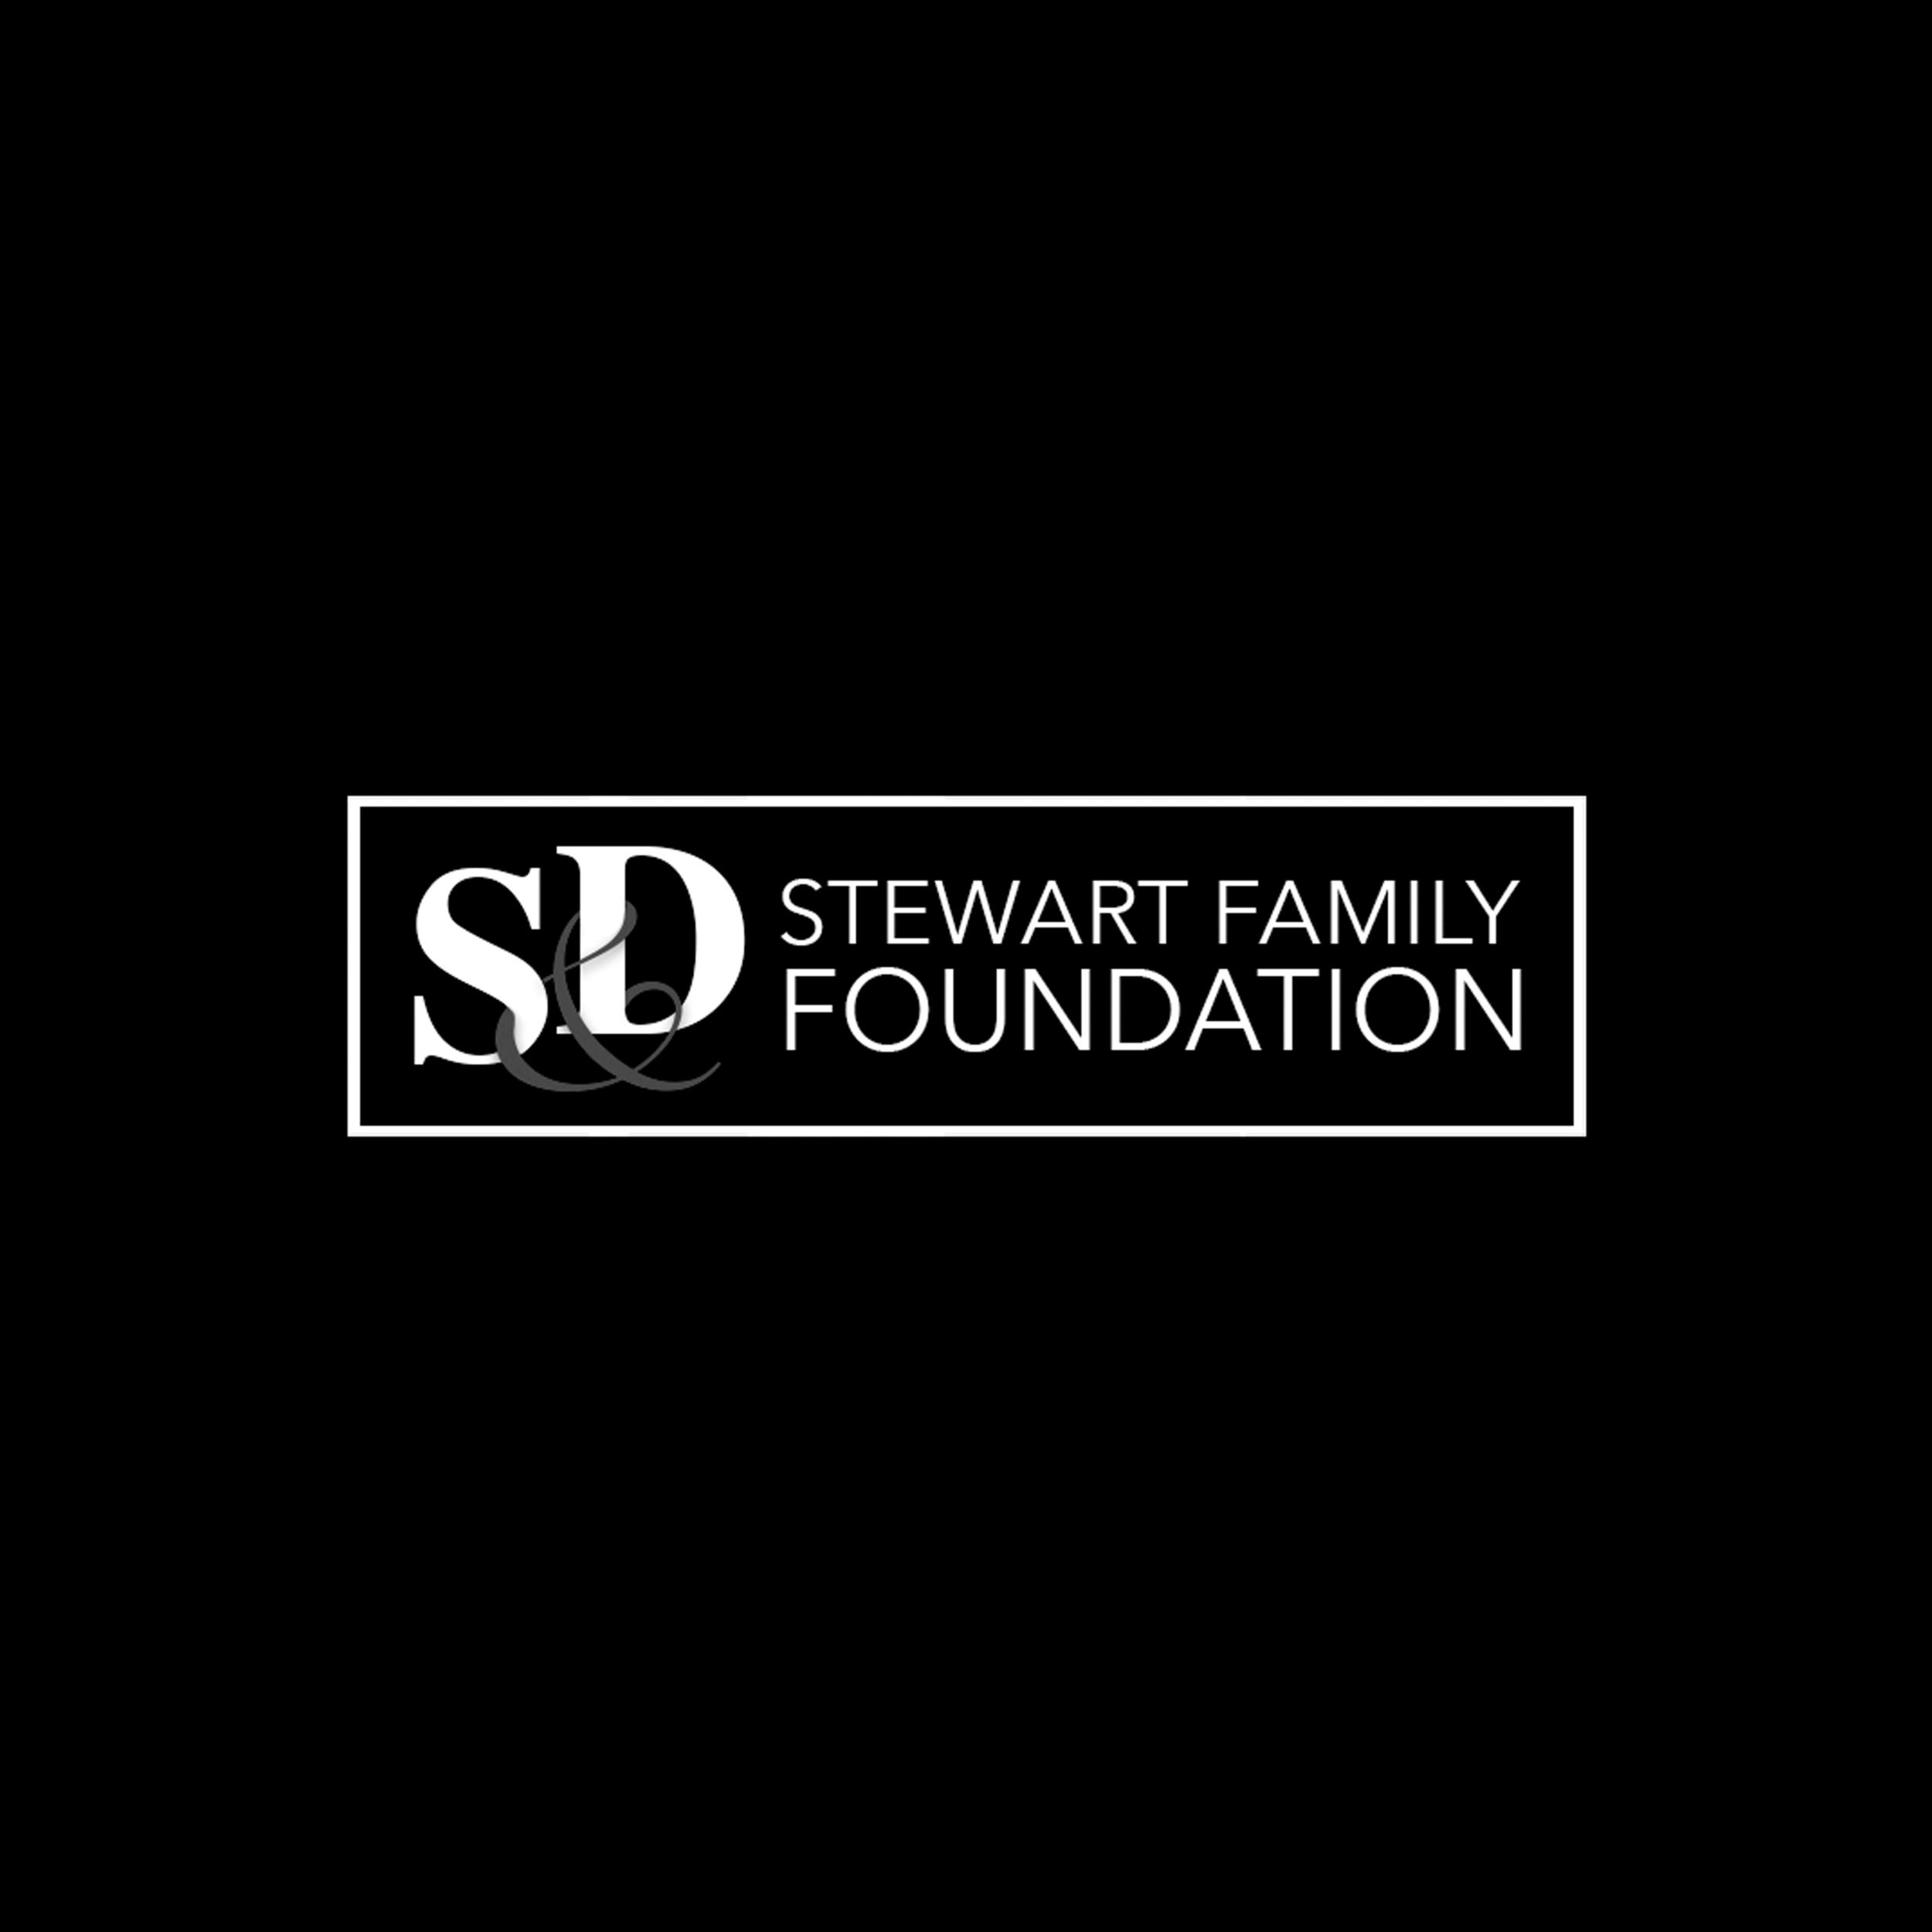 Stewart Family Foundation - stewartfamilyfoundation.org